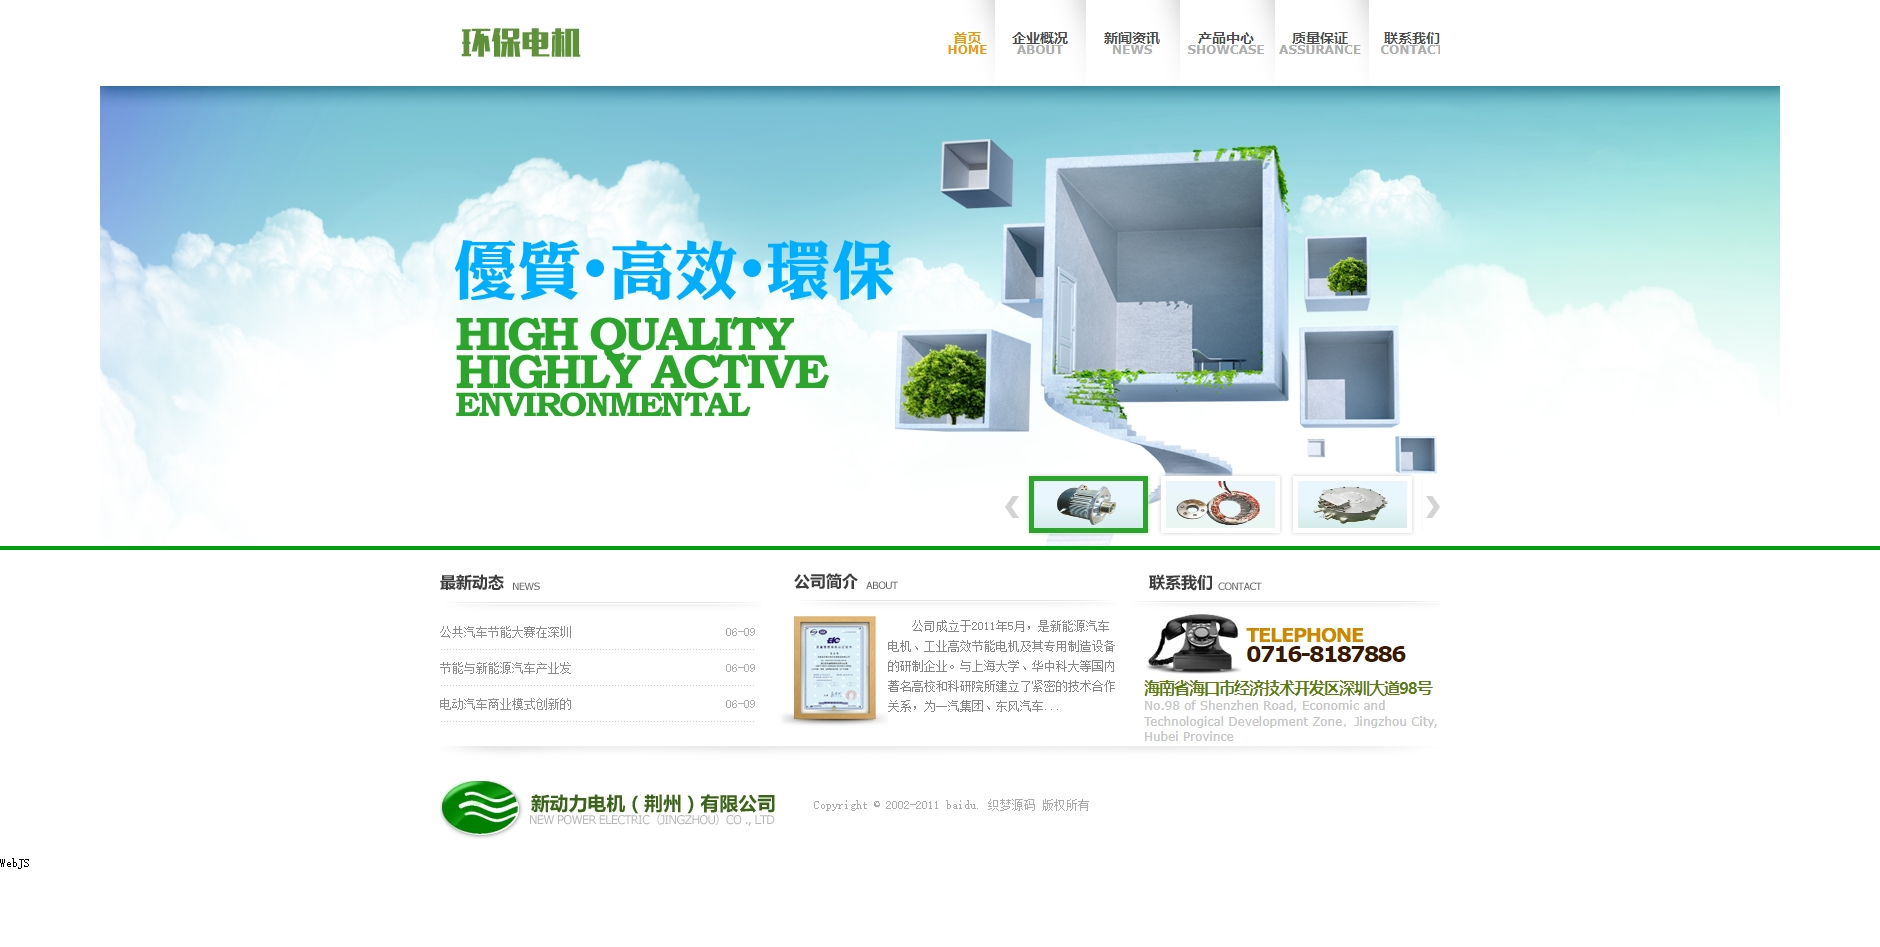 HTML5绿色大气环保设备公司织梦dedecms网站源码